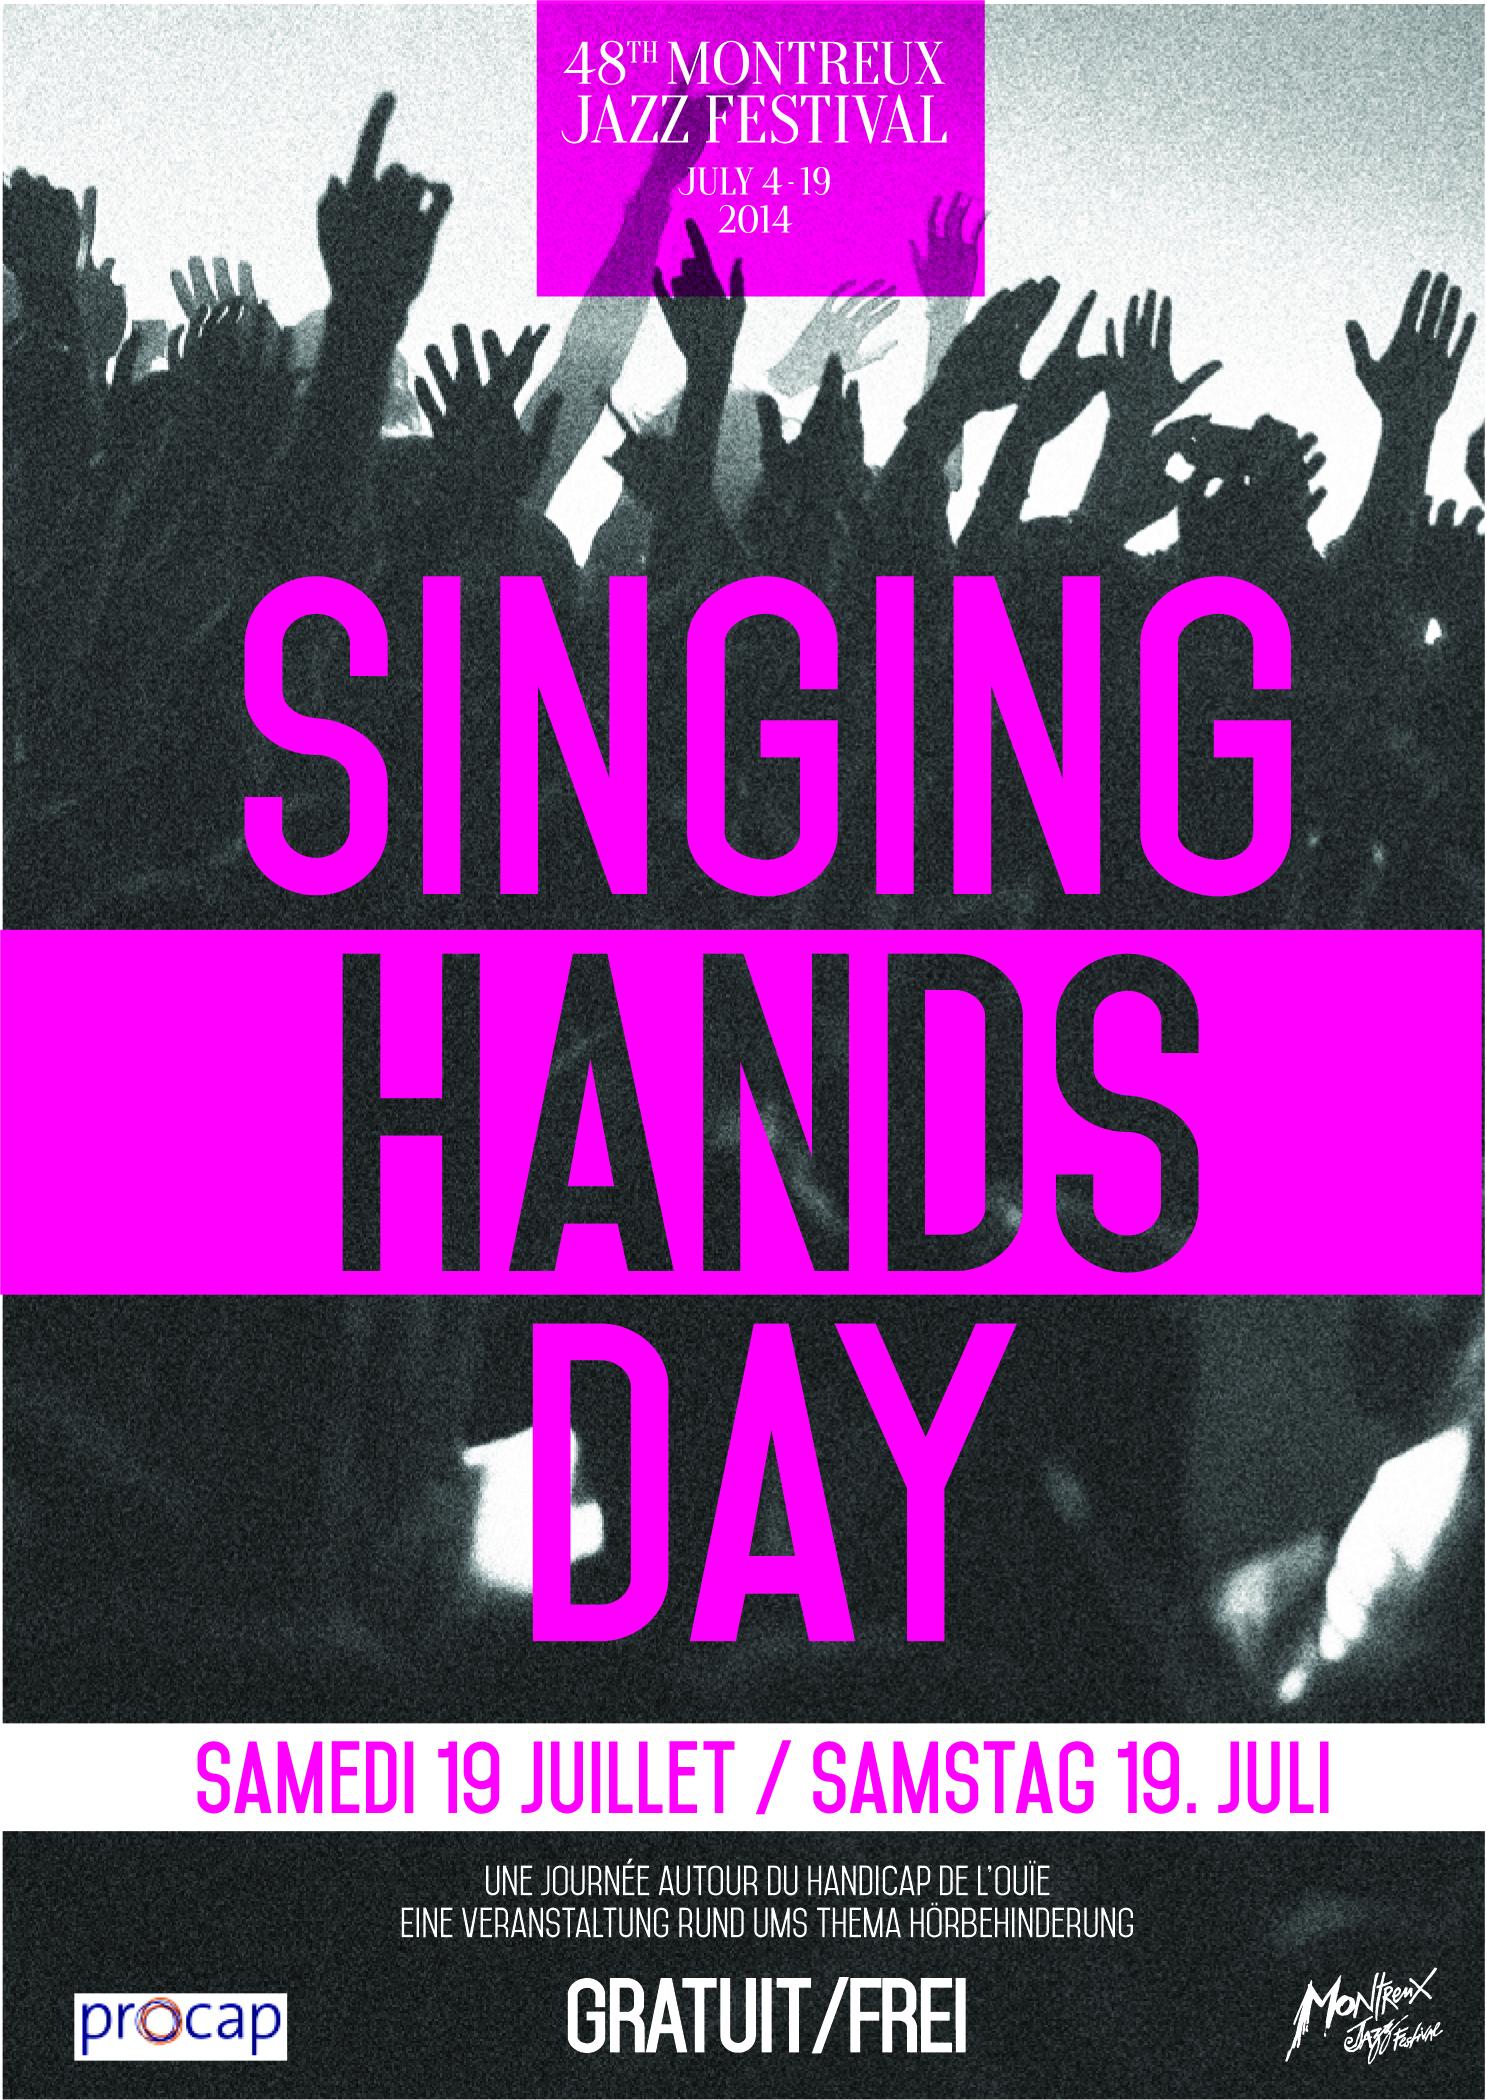 Affiche du concert Singing Hands au Montreux Jazz Festival, le samedi 19 juillet 2014